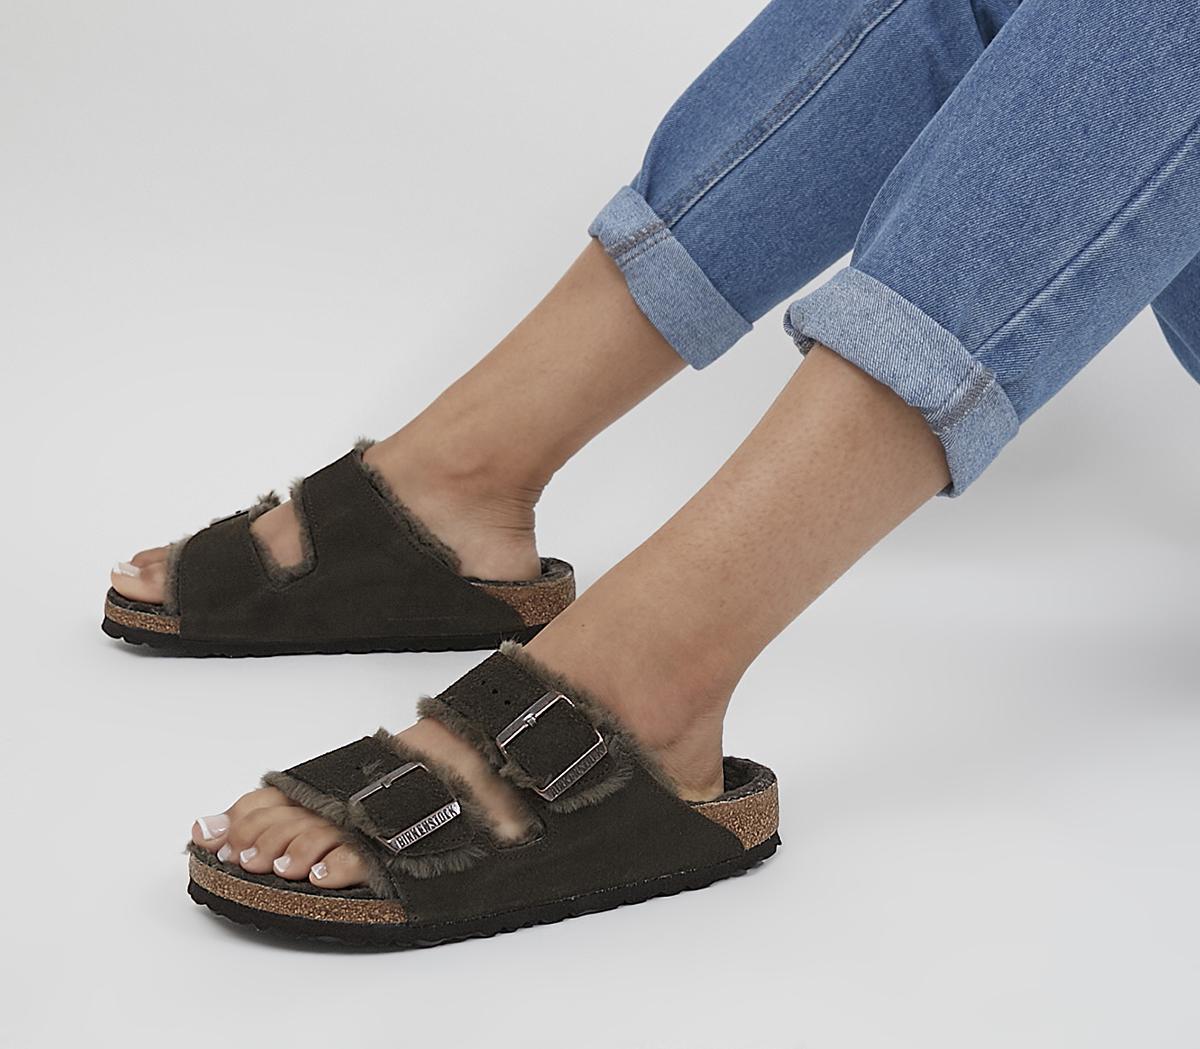 Arizona Shearling Sandals